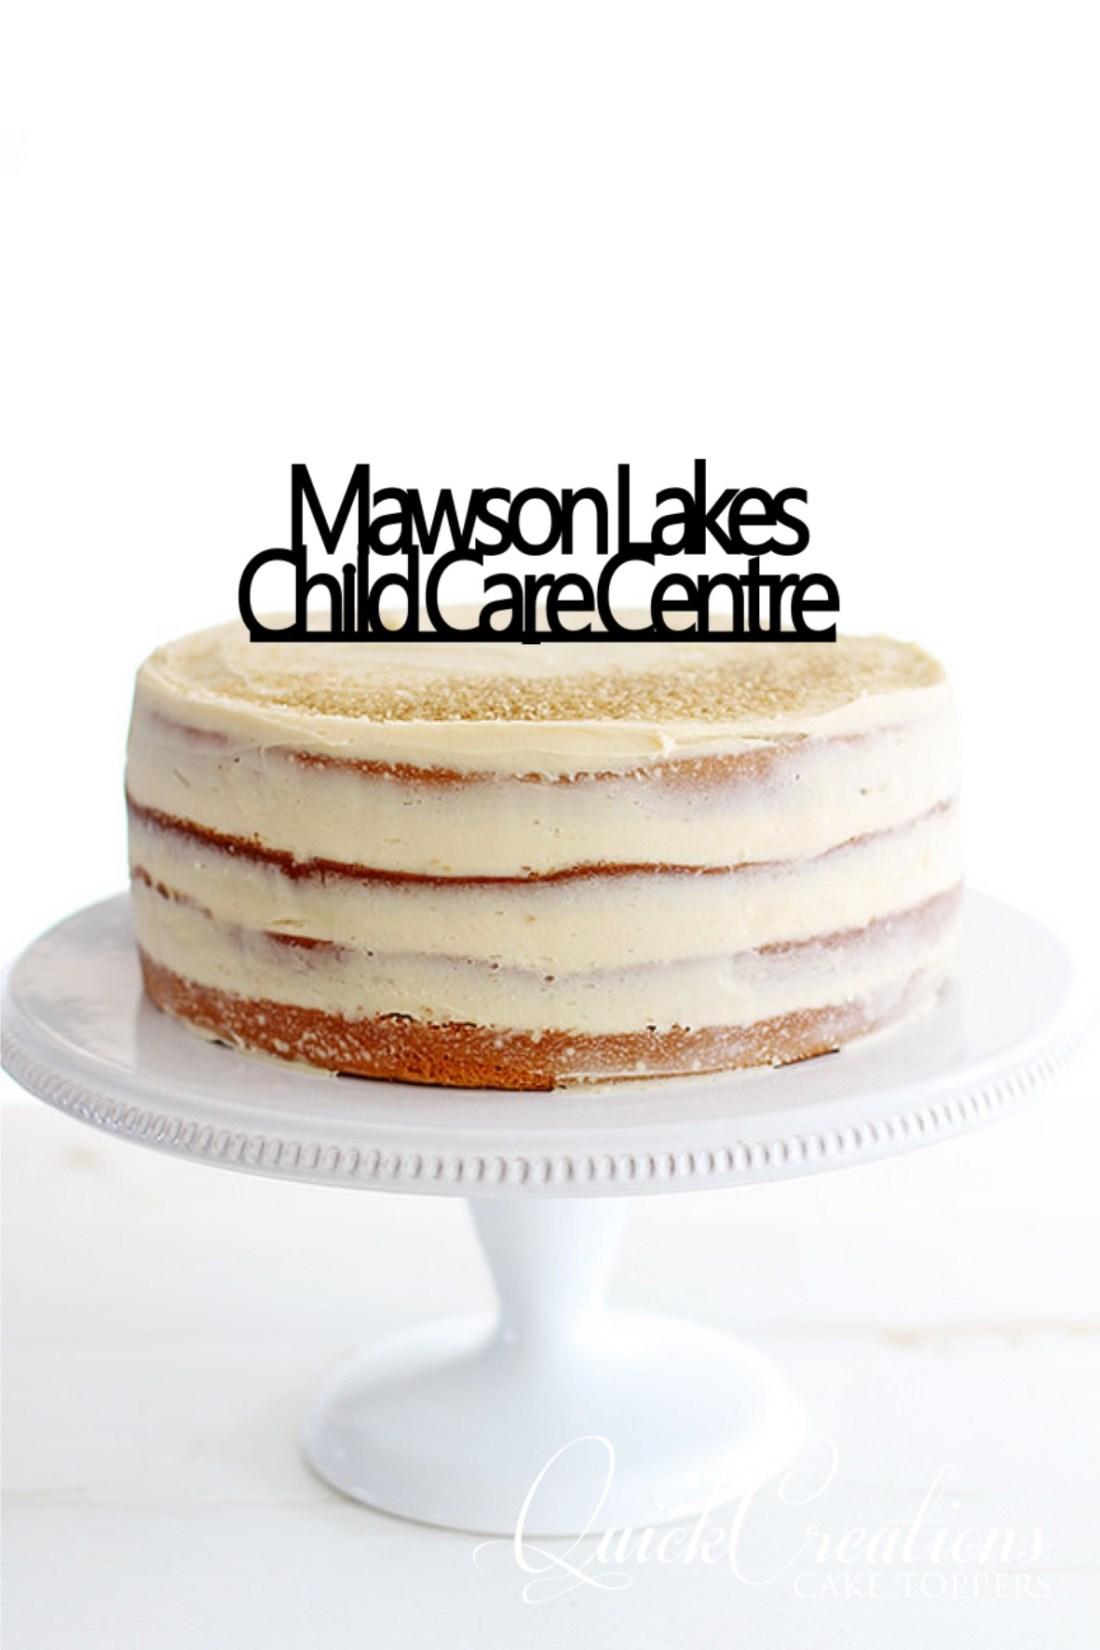 Quick Creations Cake Topper - Mawson Lakes Child Care Centre